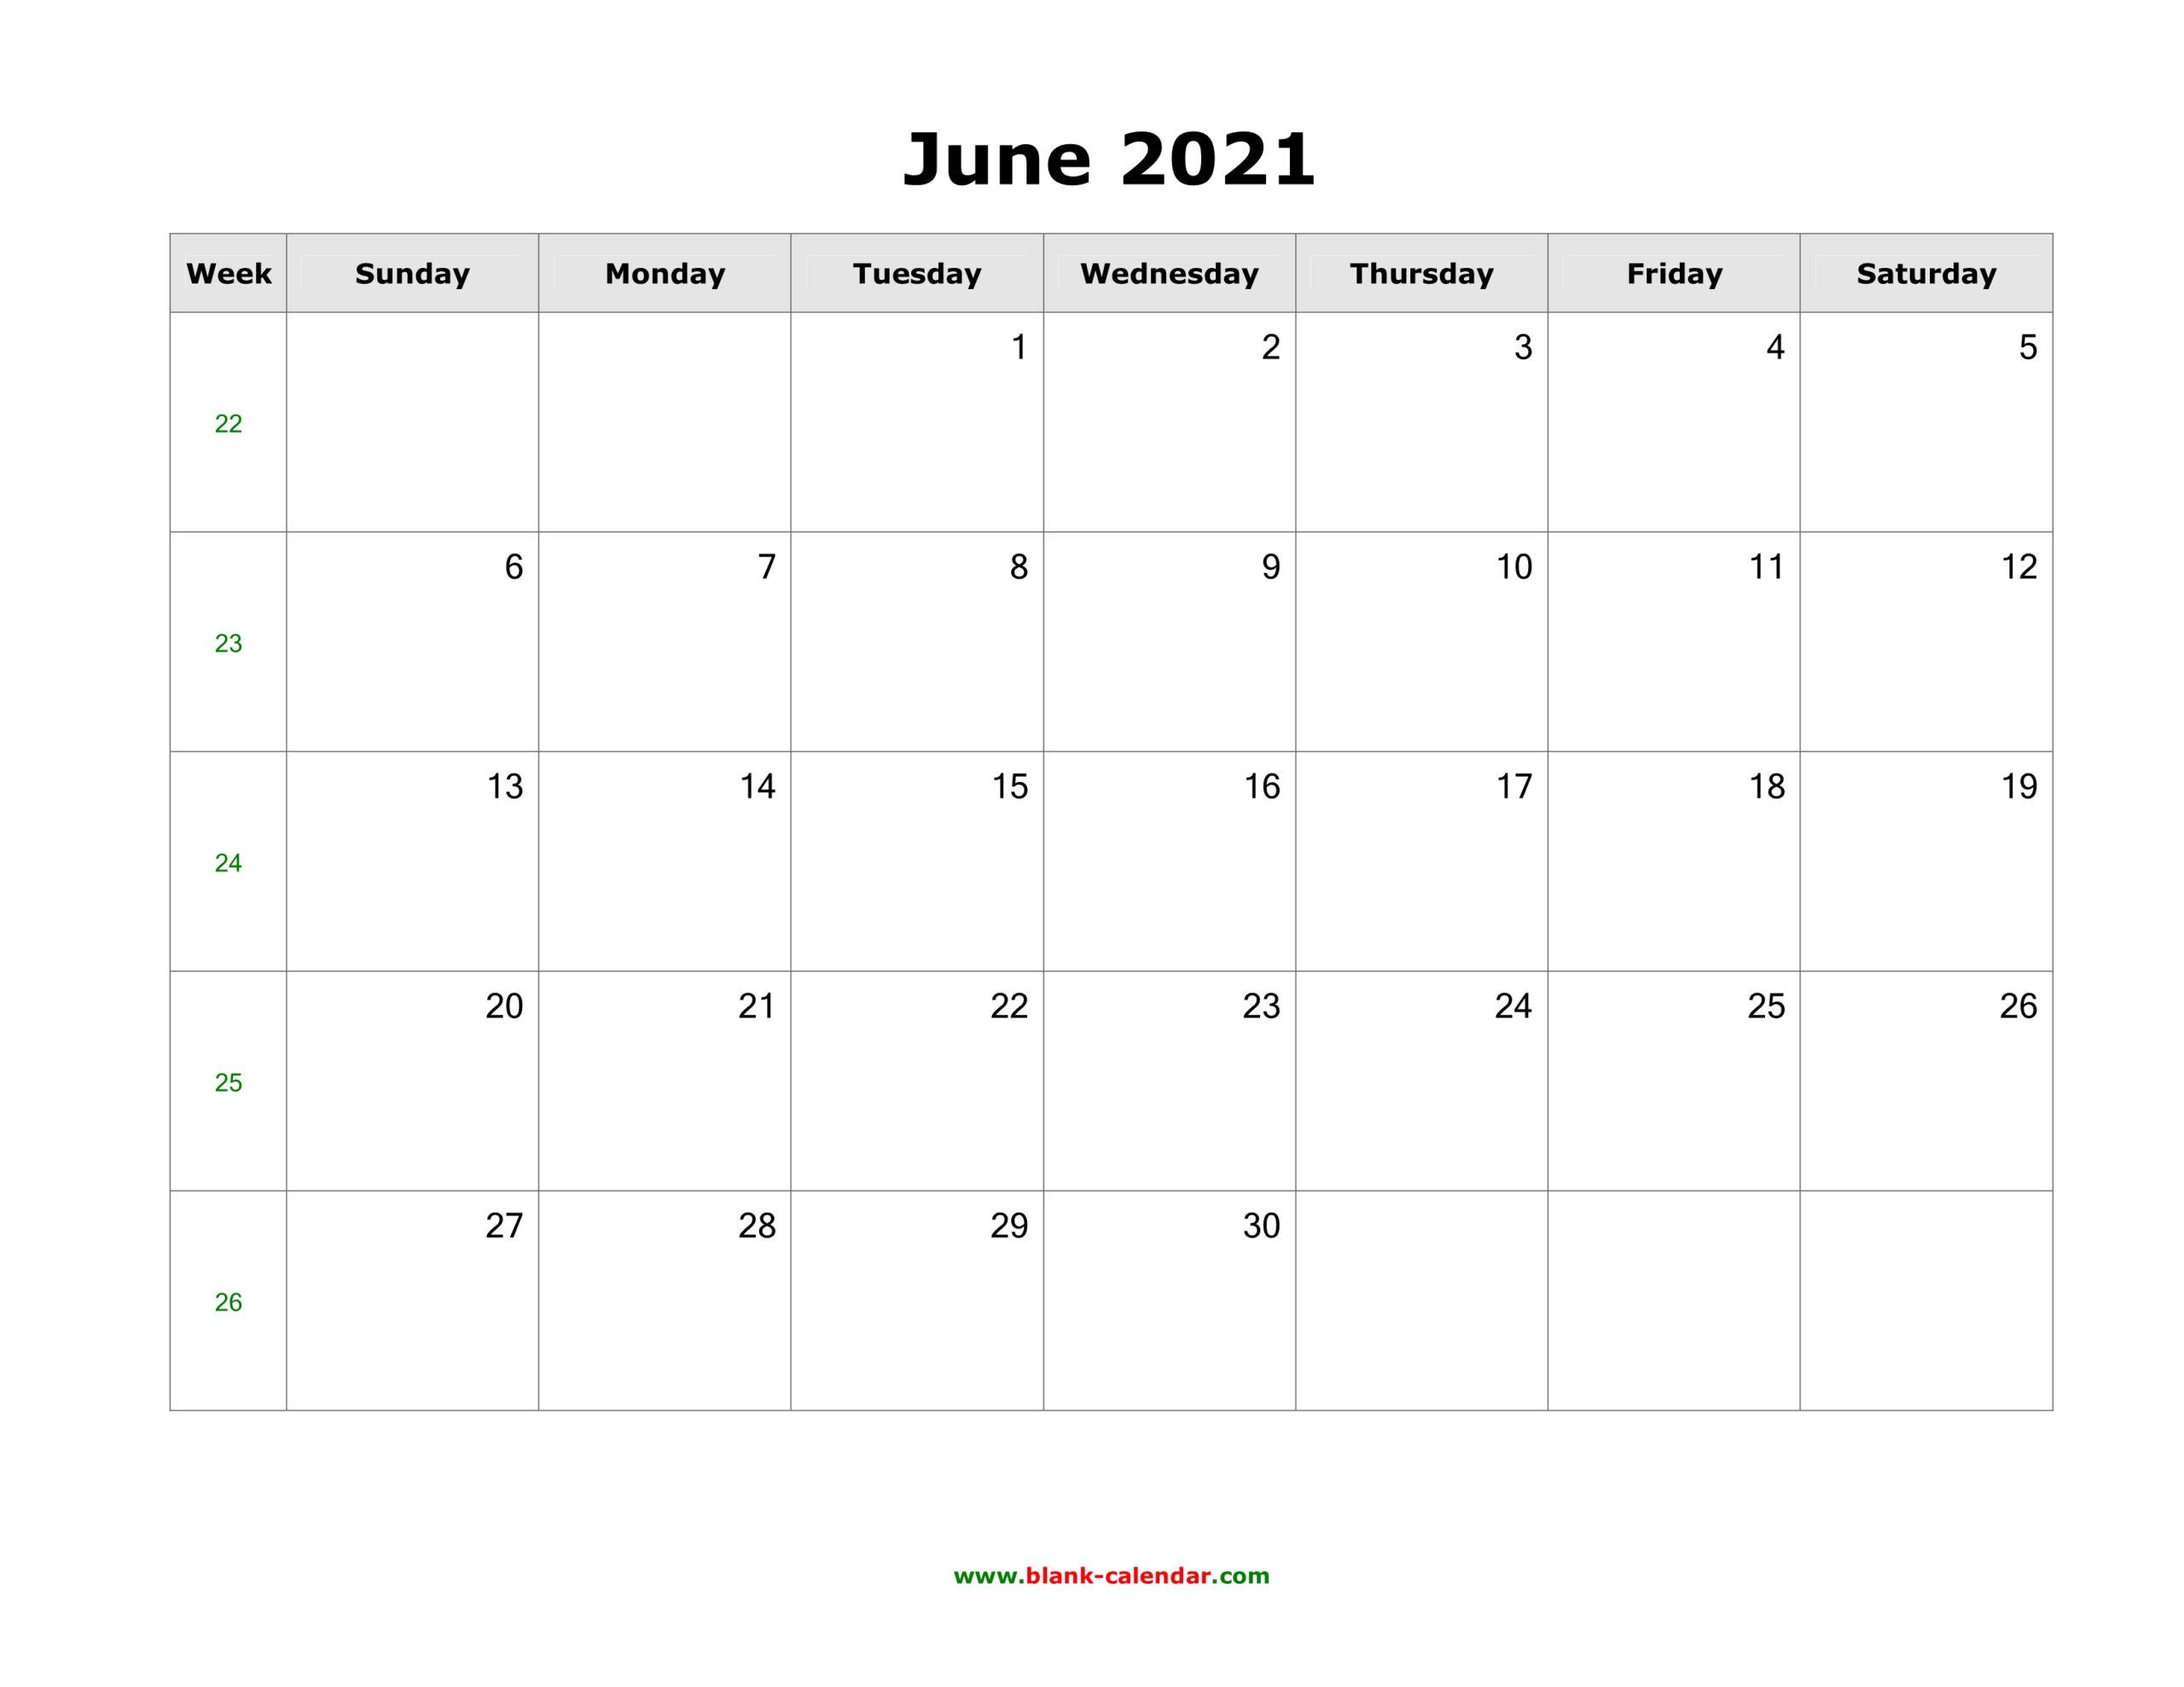 June 2021 Blank Calendar   Free Download Calendar Templates pertaining to 3 Month Blank Printable Calendar 2021